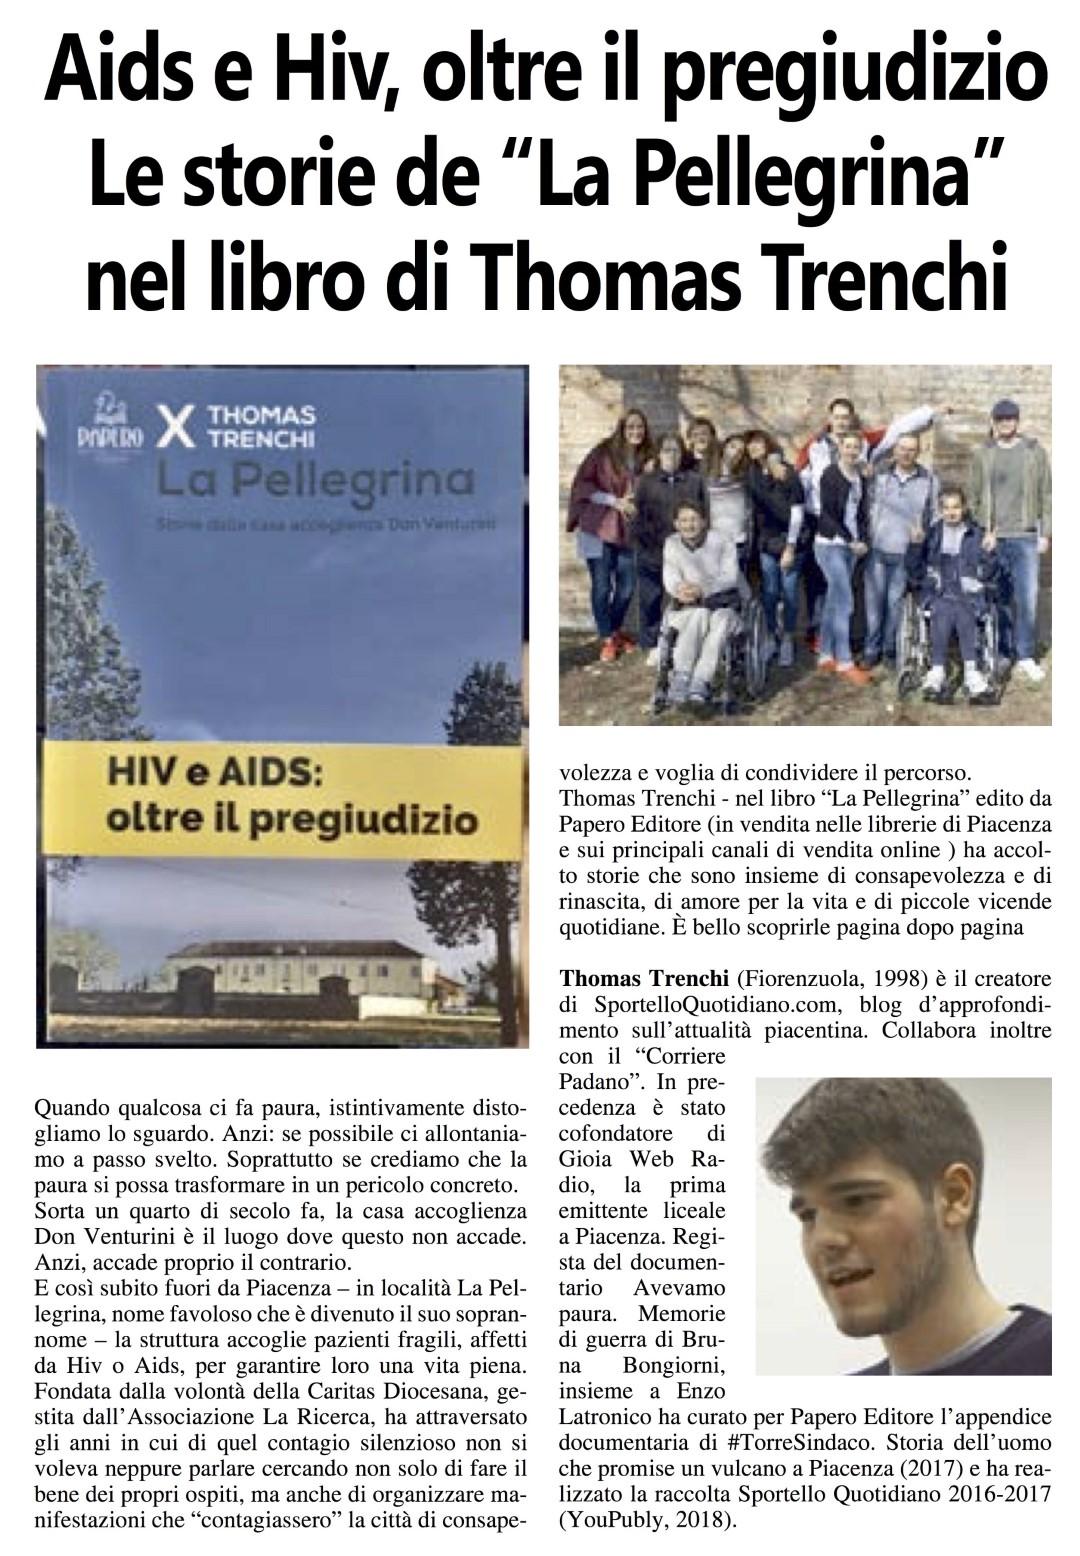 Corriere Padano Pellegrina Thomas Trenchi